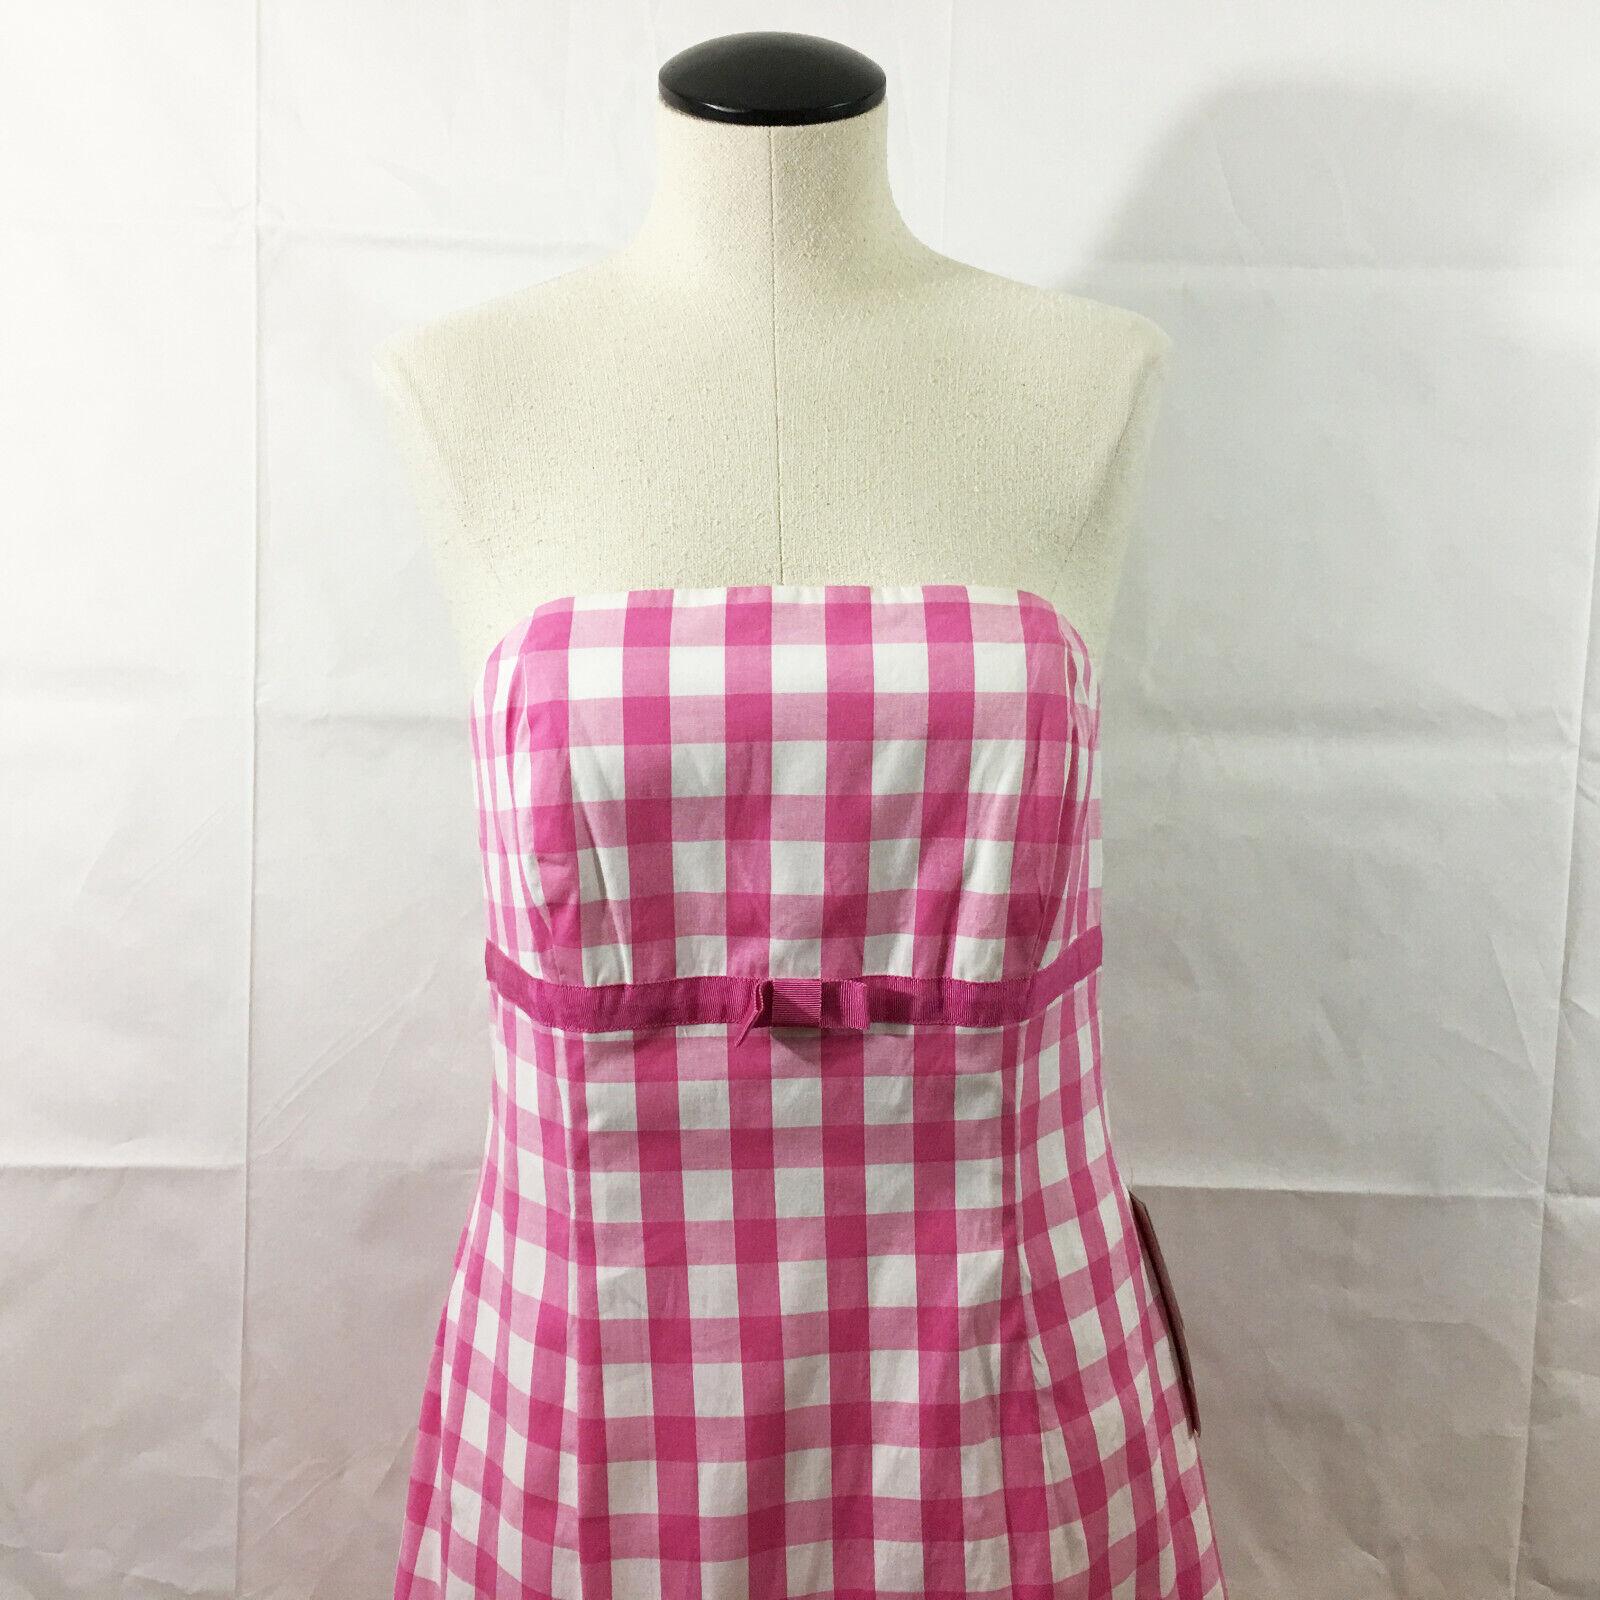 P4 Lilly Pulitzer Kelly Rosa Picnic Check Dress Sz 10 damen Strapless Plaid